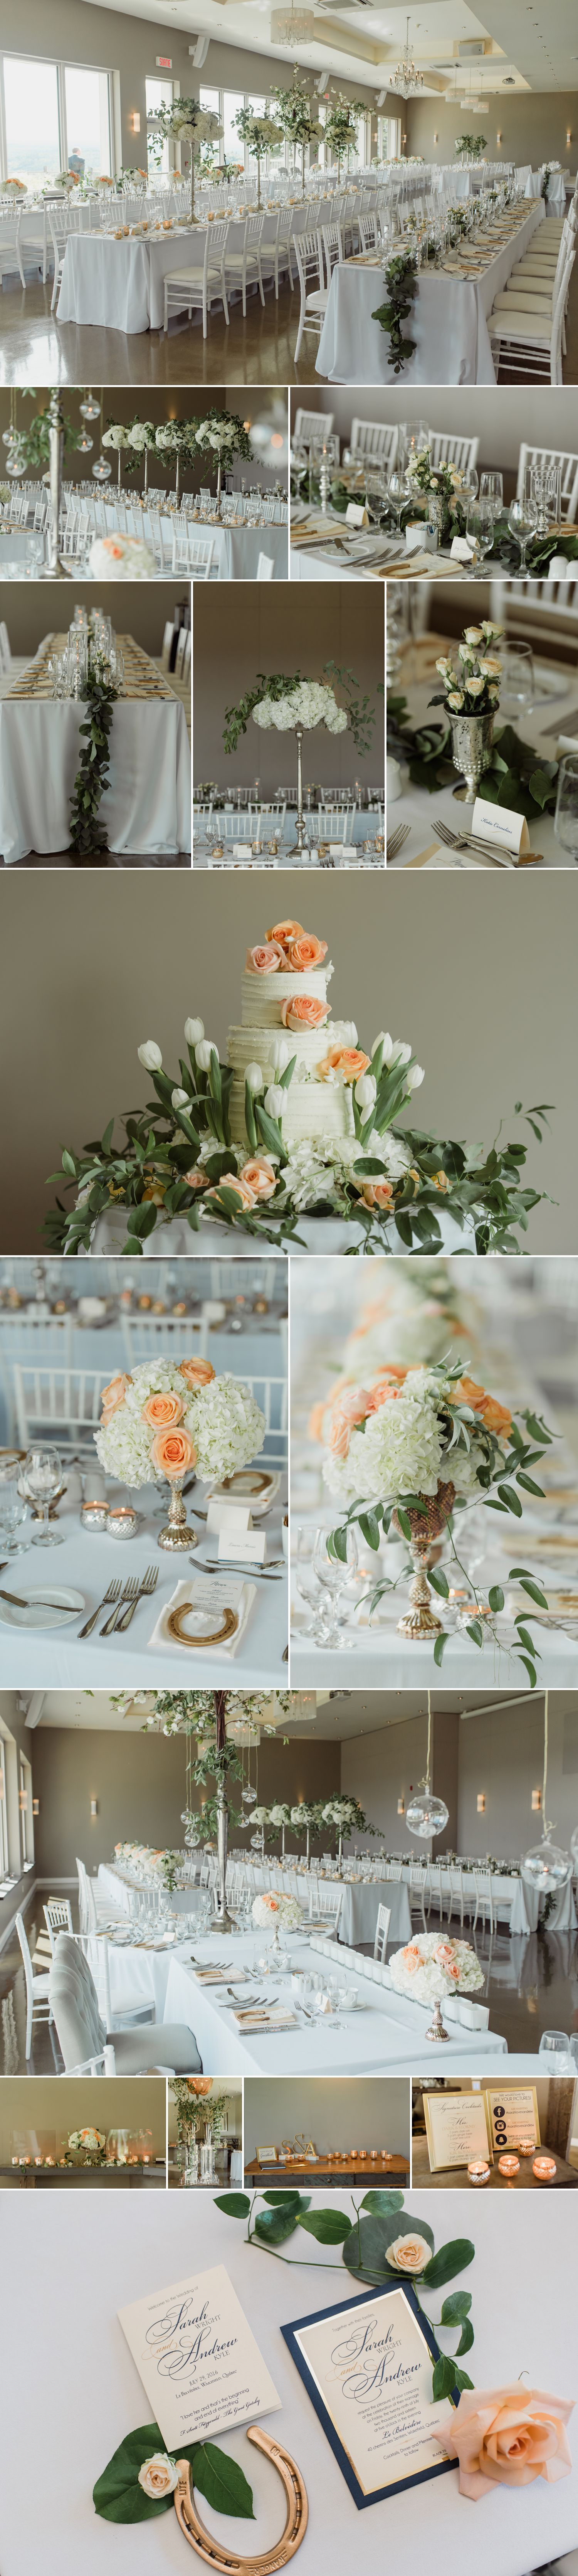 wedding-details-at-le-belvedere-wedding-in-wakefield-quebec.jpg